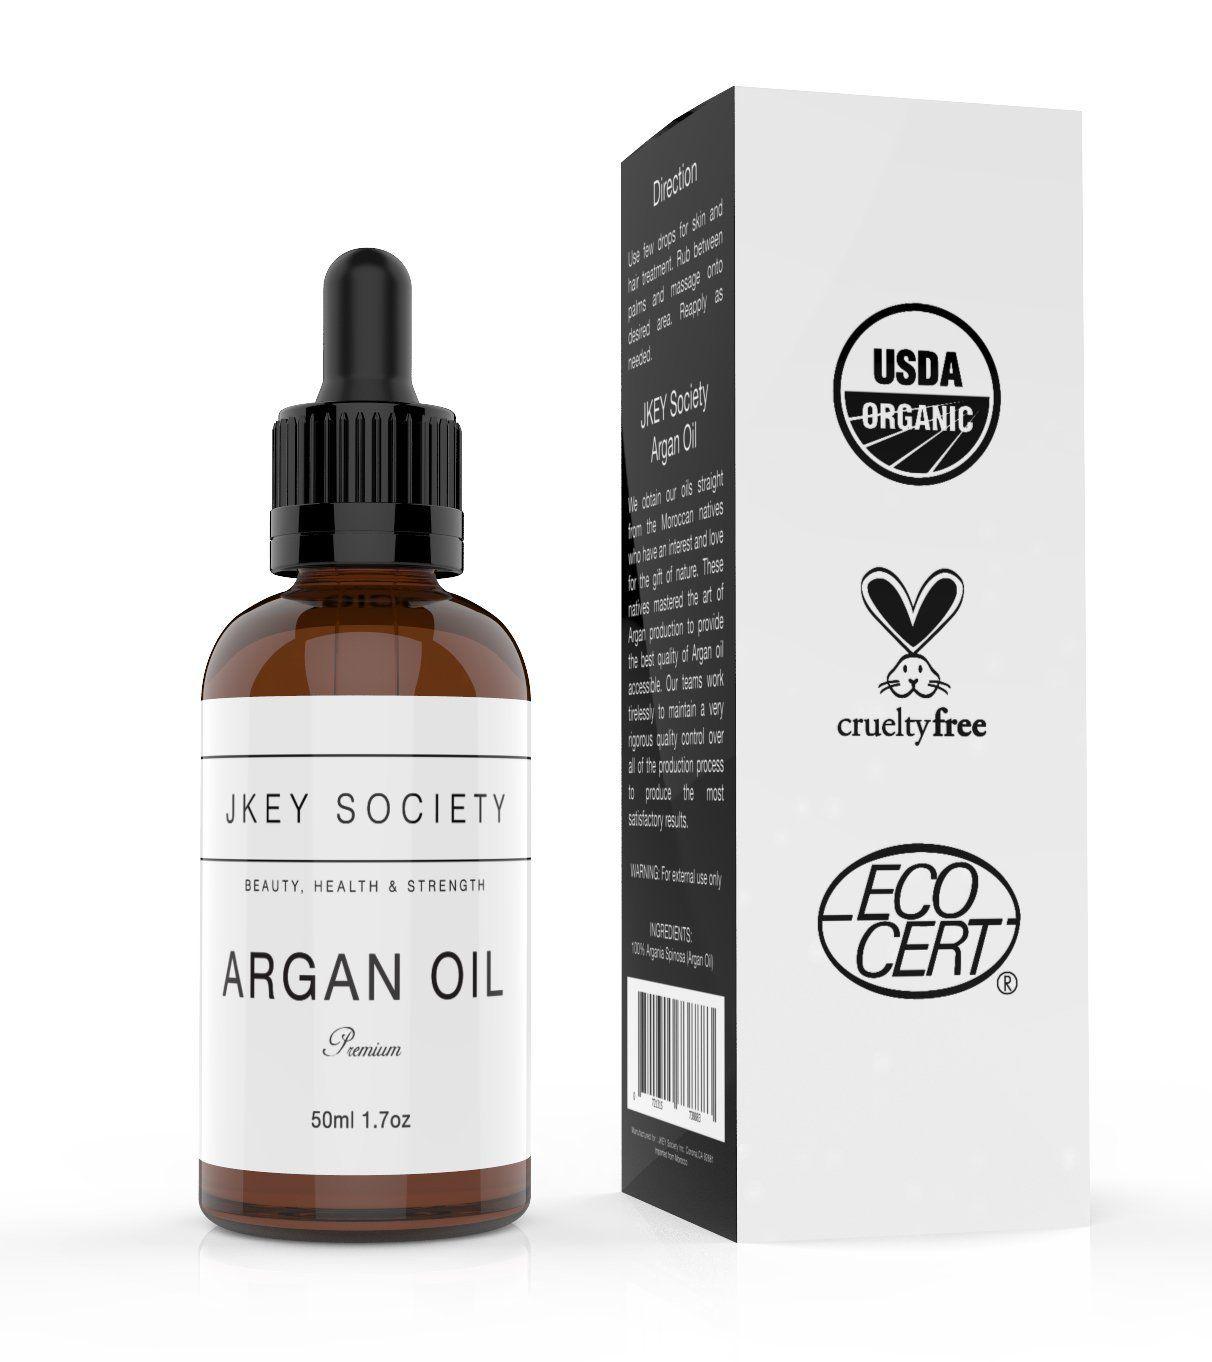 JKEY SOCIETY Organic Moroccan Argan Oil 100 USDA